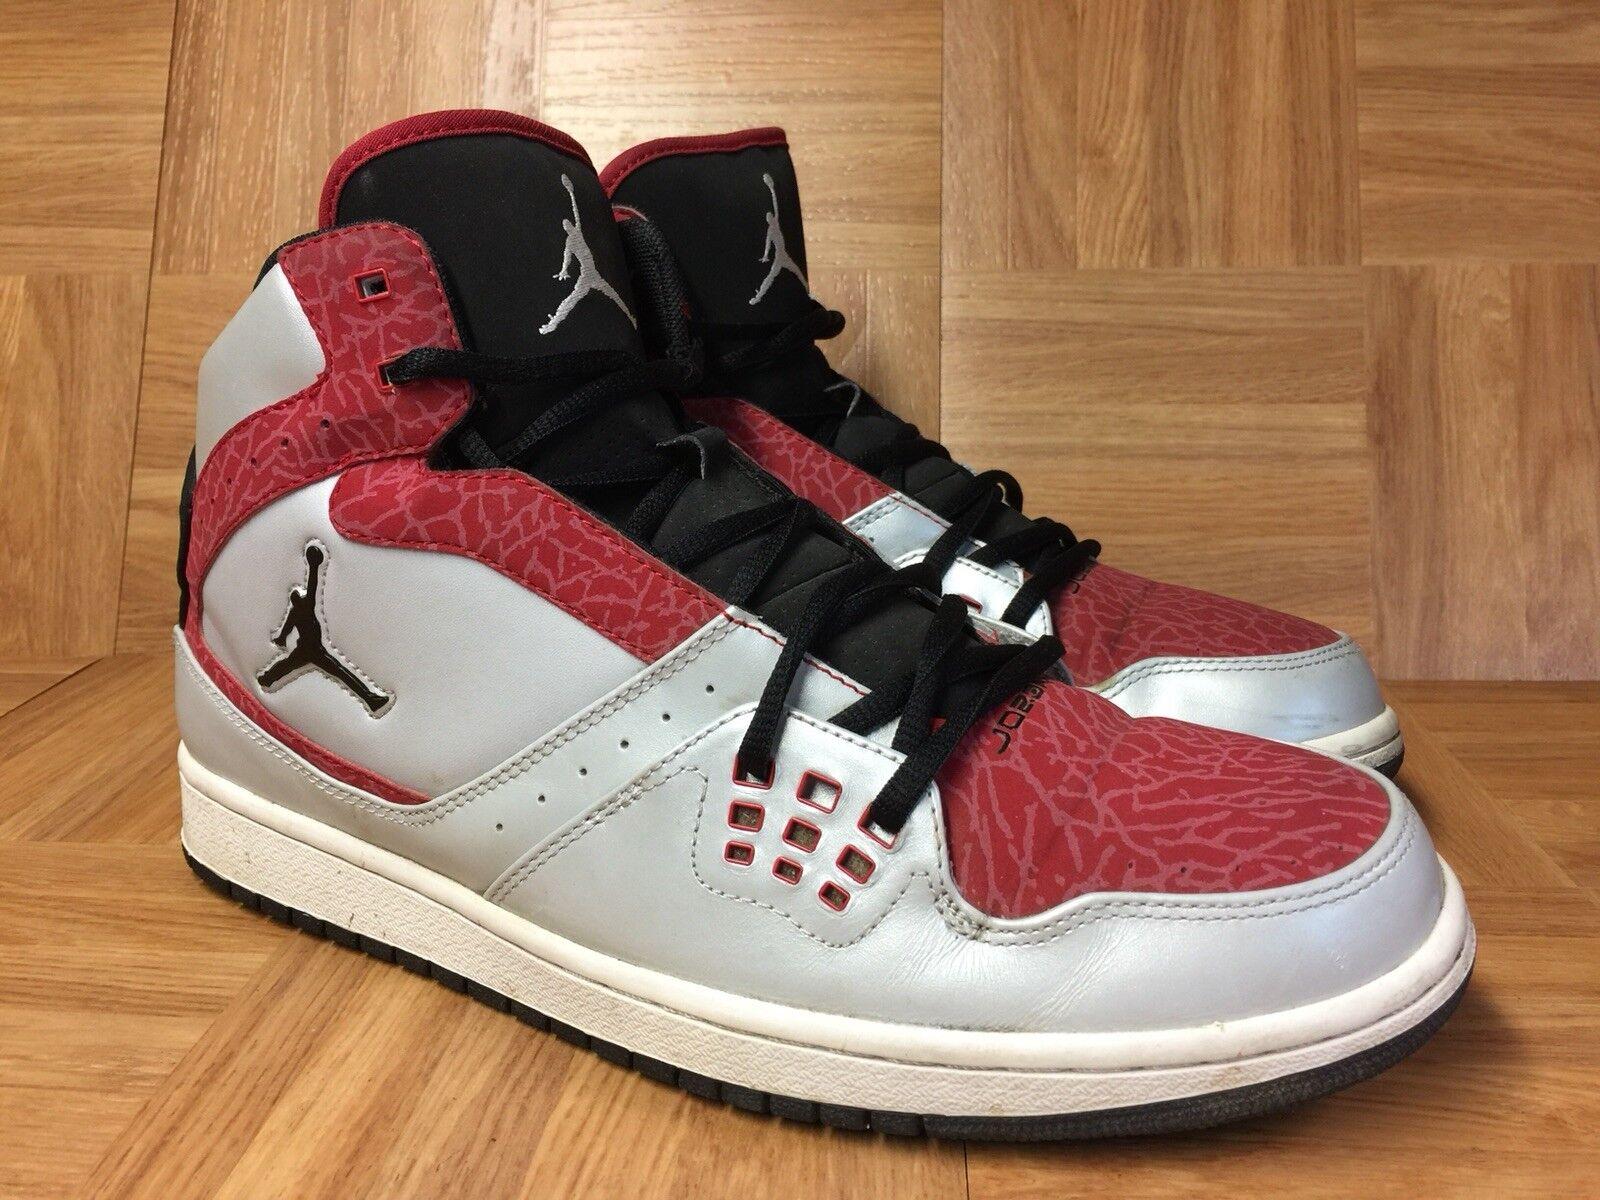 fd72da286271 RARE RARE RARE Nike Air Jordan Flight Platinum Black Red Silver Size 11  372704-017